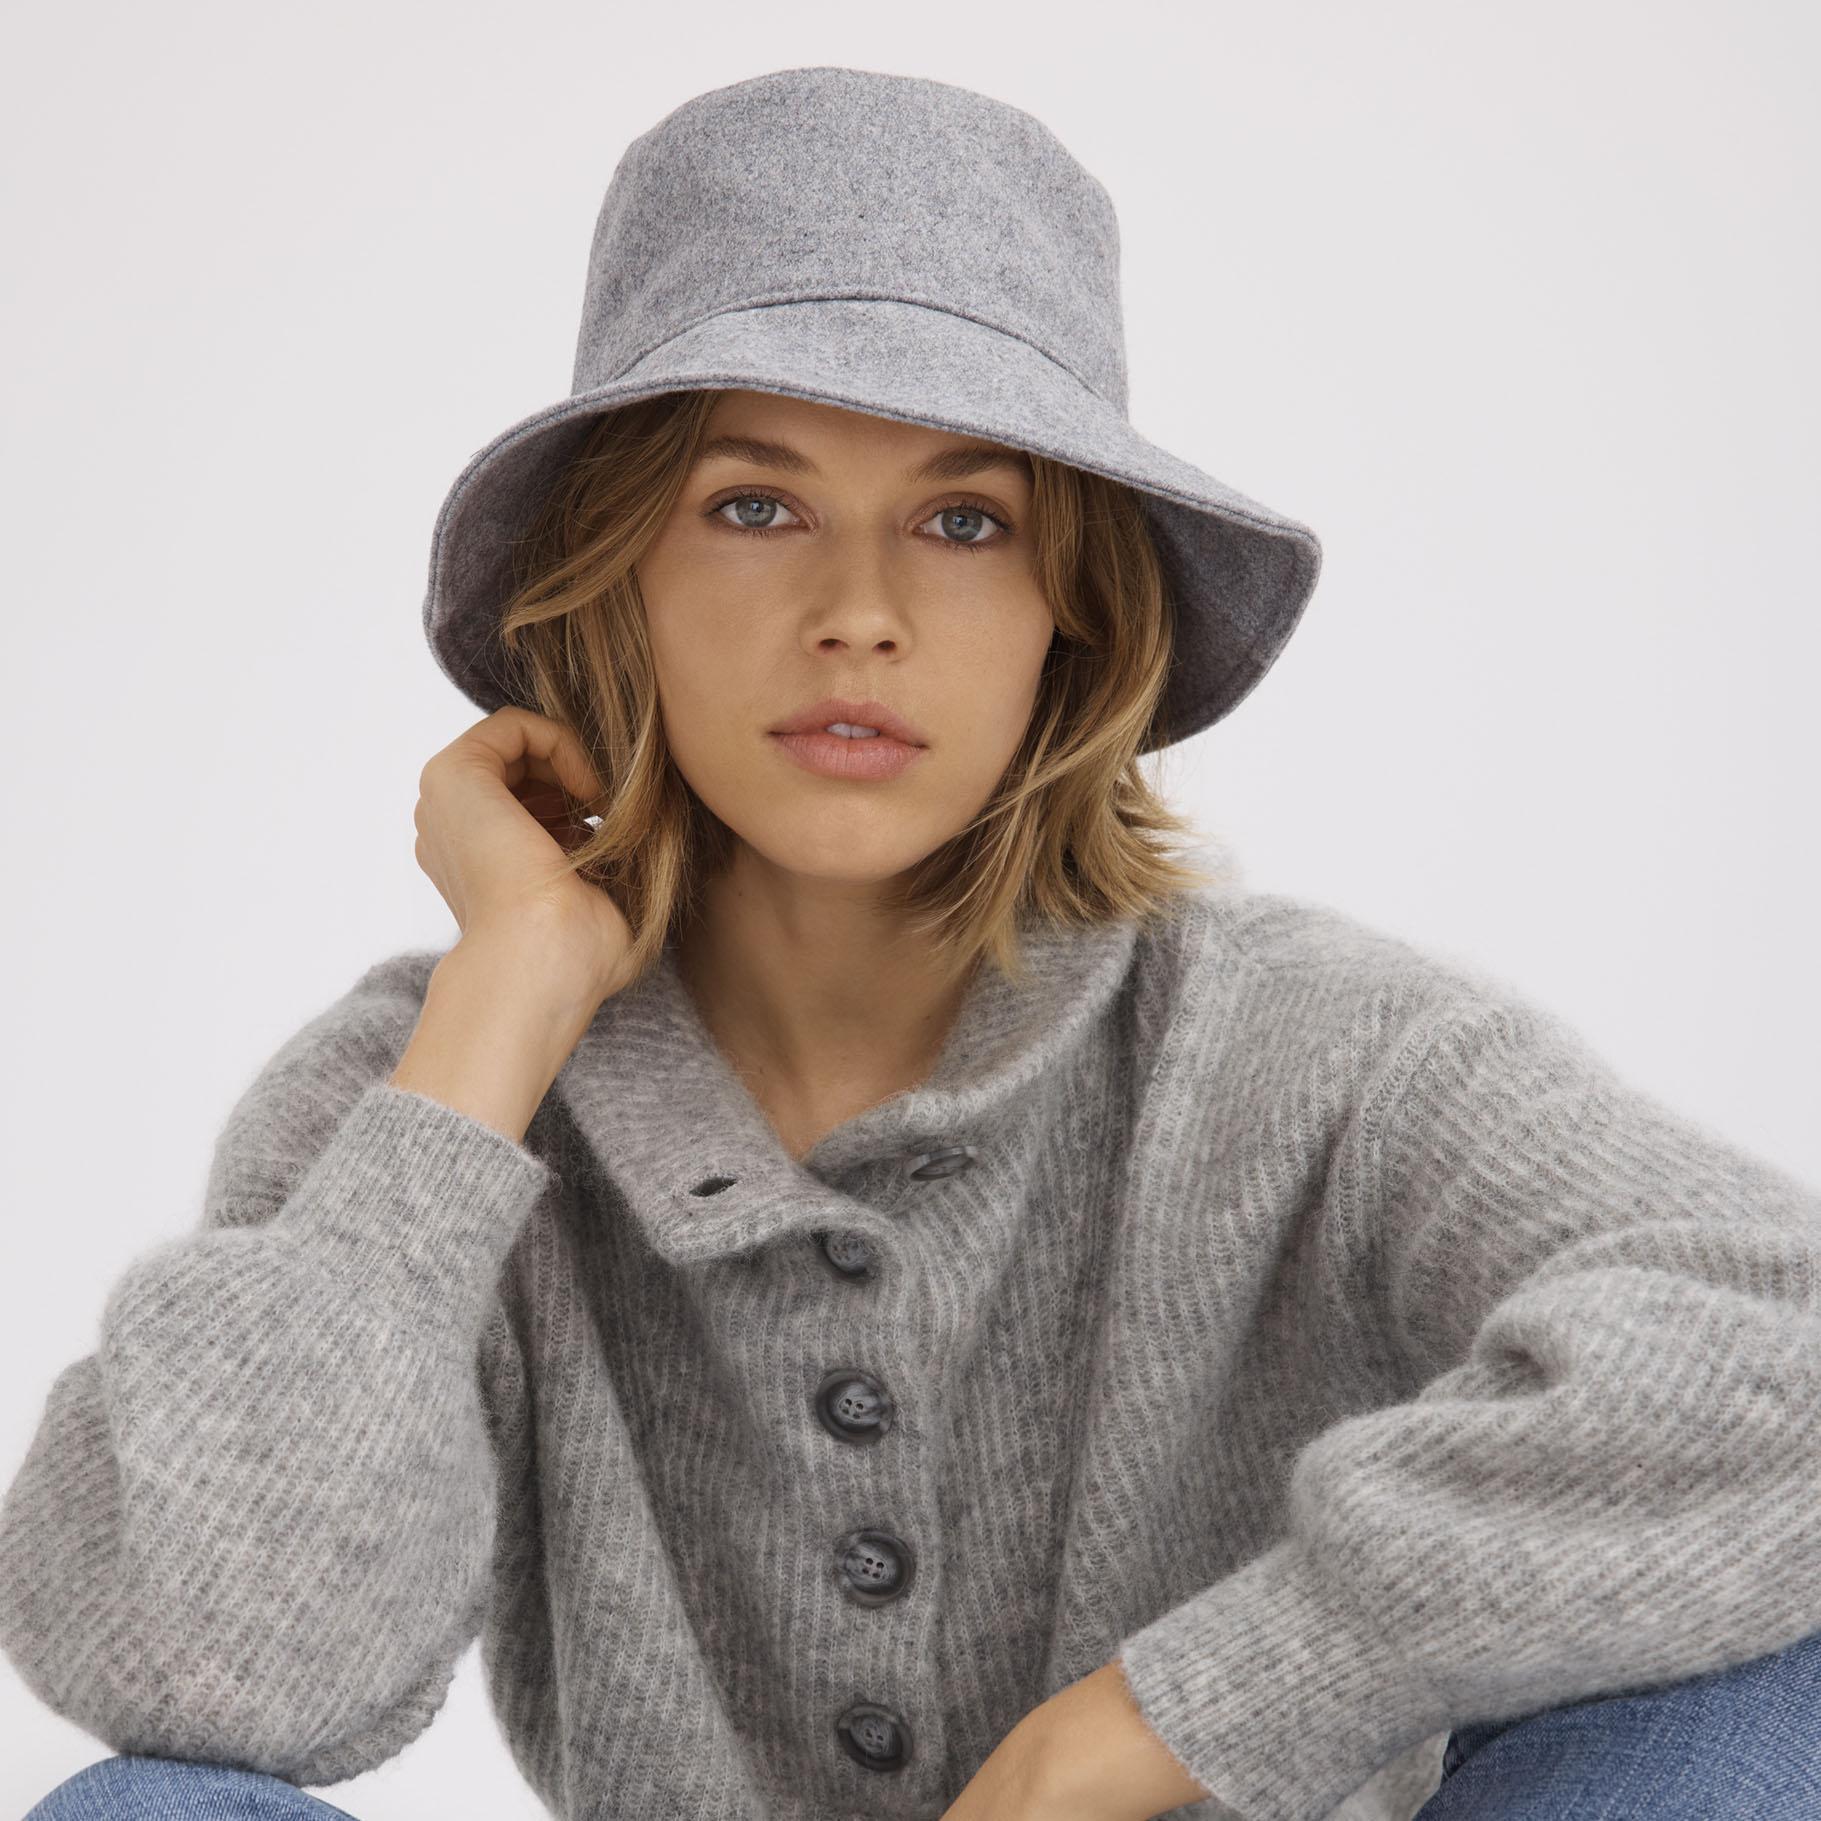 Seed Winter Fashion Item